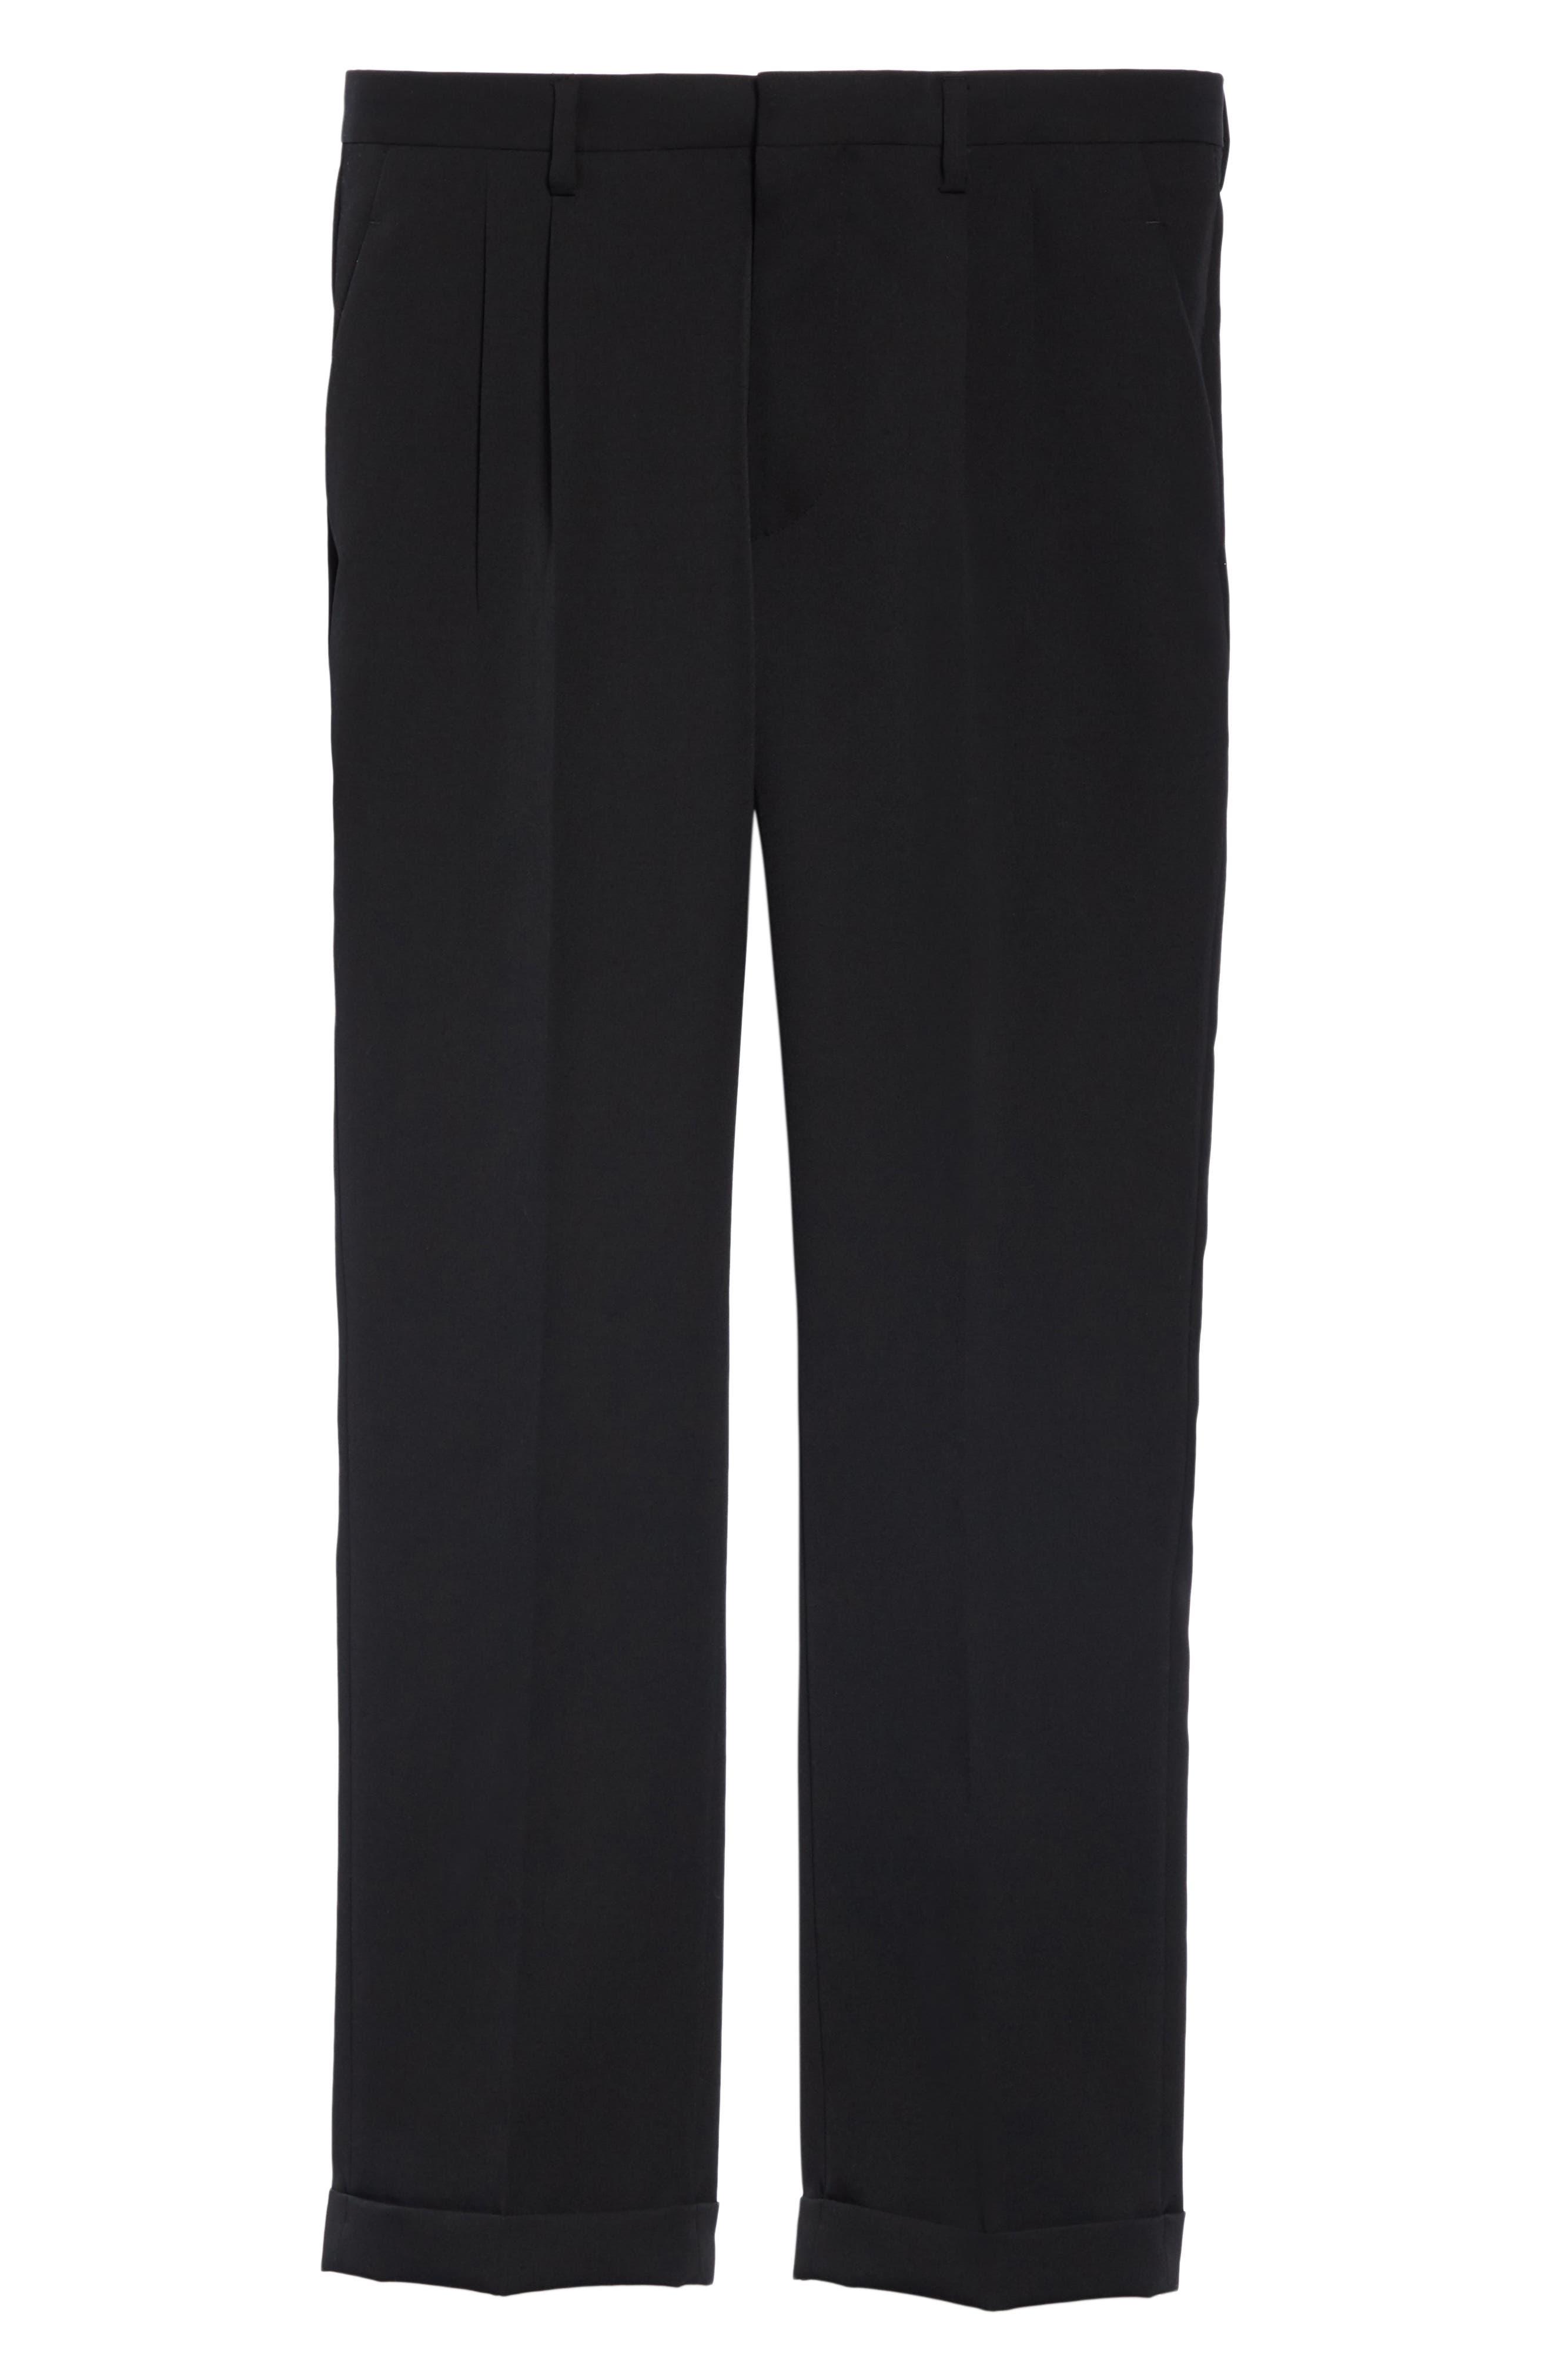 CALVIN KLEIN 205W39NYC, Pleated Gabardine Wool Trousers, Alternate thumbnail 6, color, BLACK